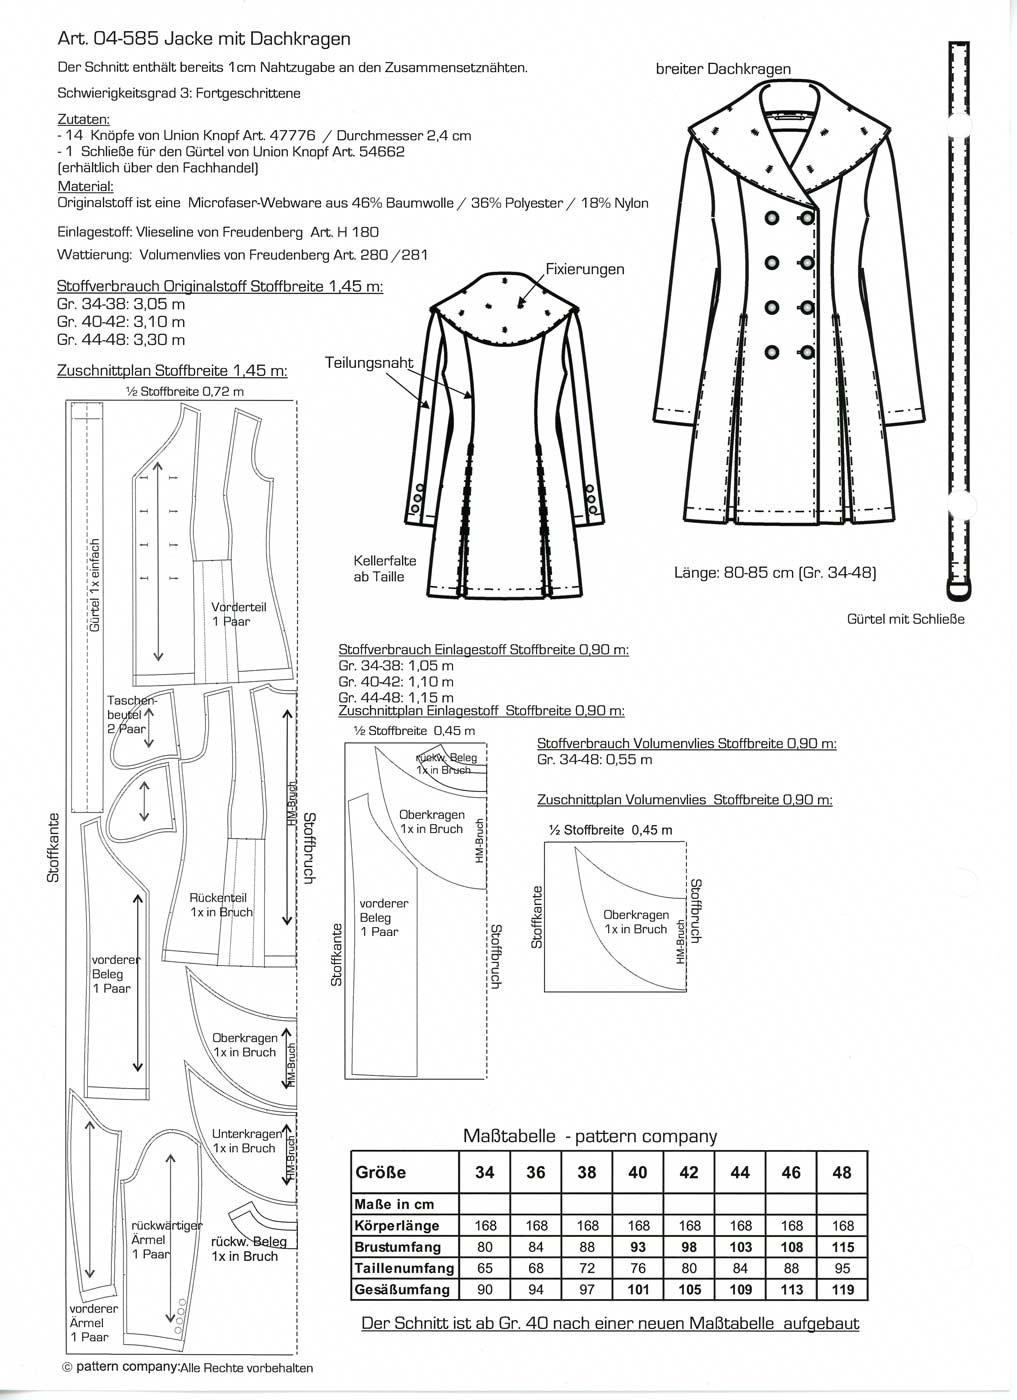 Schnittmuster - Jacke mit Dachkragen - 04-585 - Pattern Company